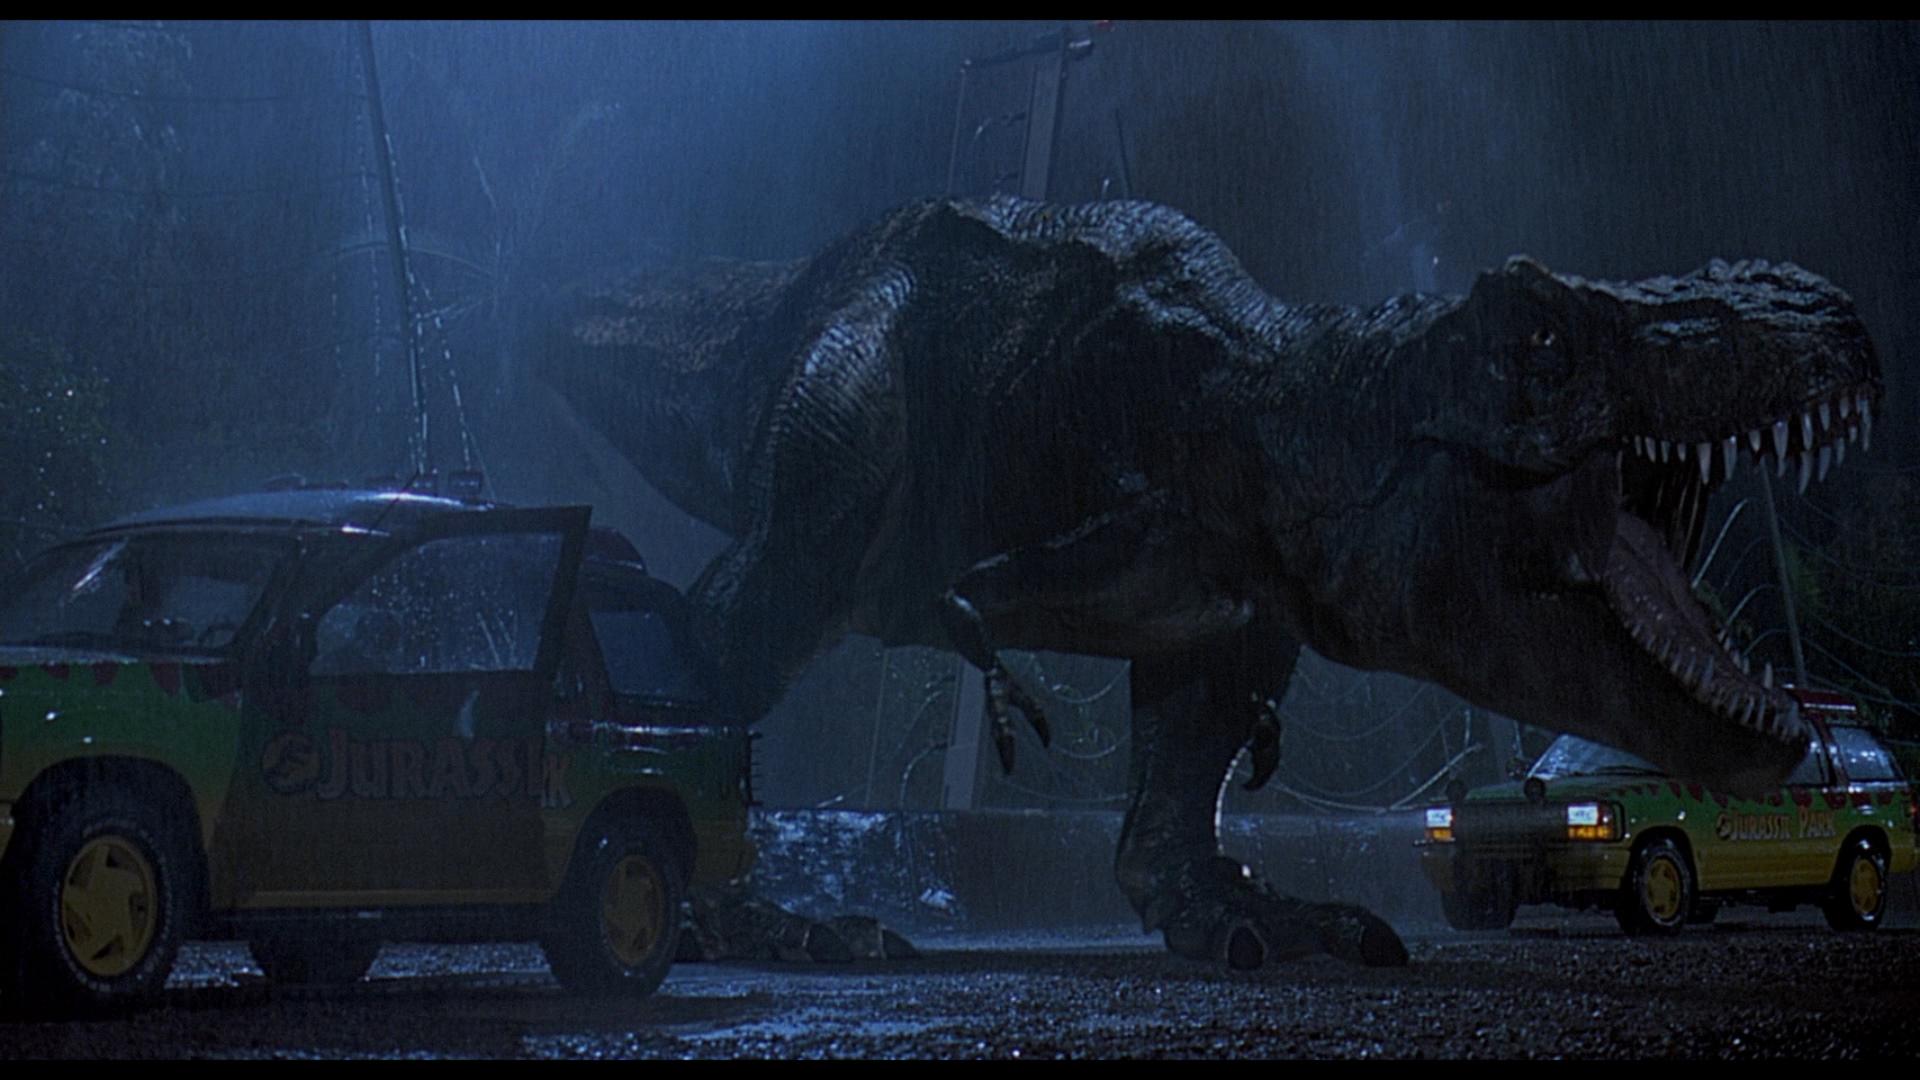 https://i1.wp.com/www.dvdbeaver.com/film3/blu-ray_reviews55/jurassic_park_blu-ray_/large/large_jurassic_park_blu-ray_3x.jpg